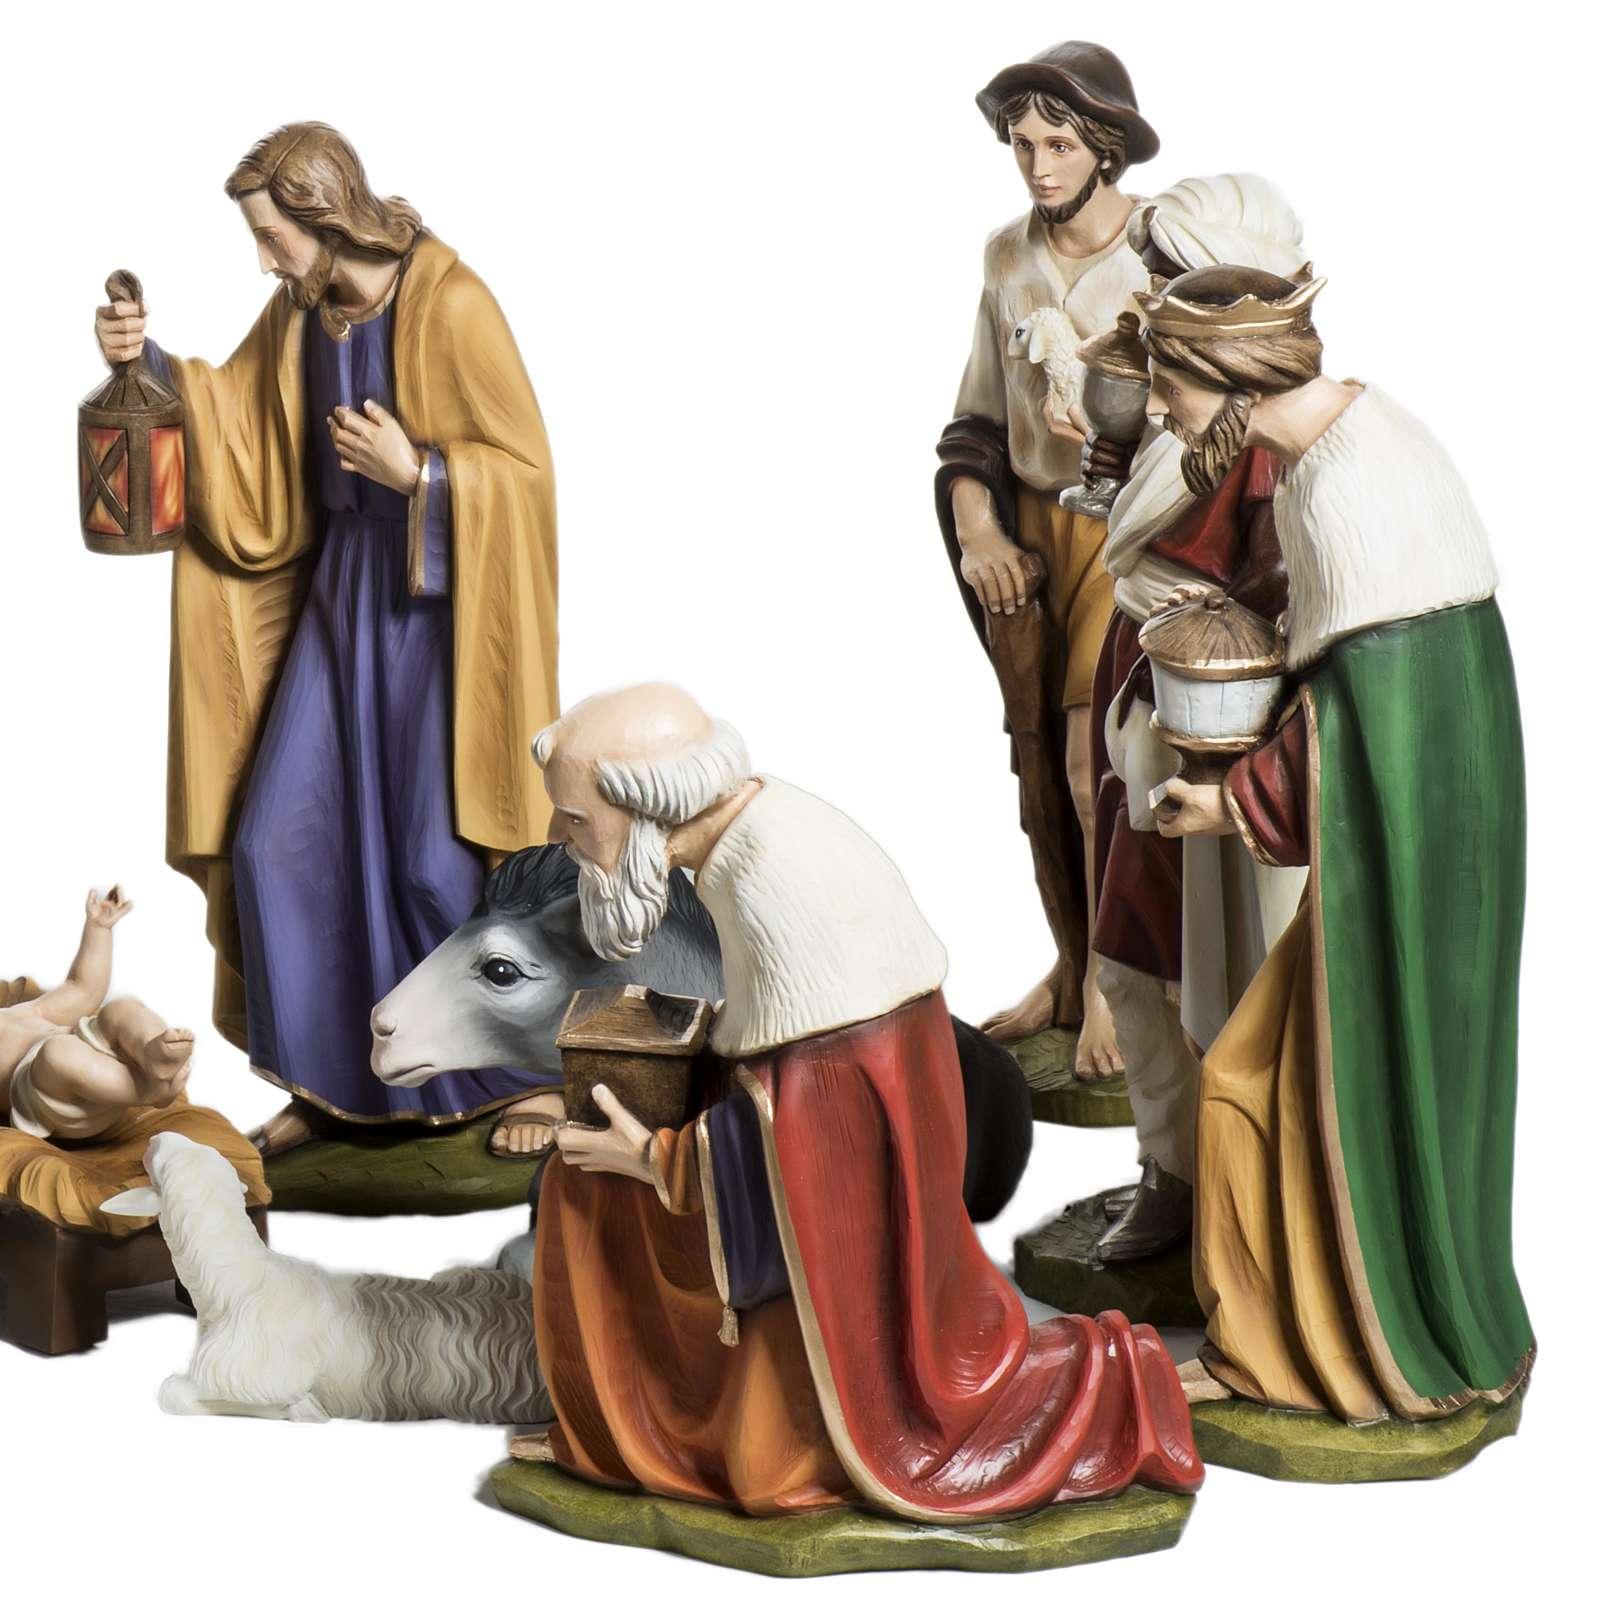 Presepe completo vetroresina 60 cm 15 statue 4